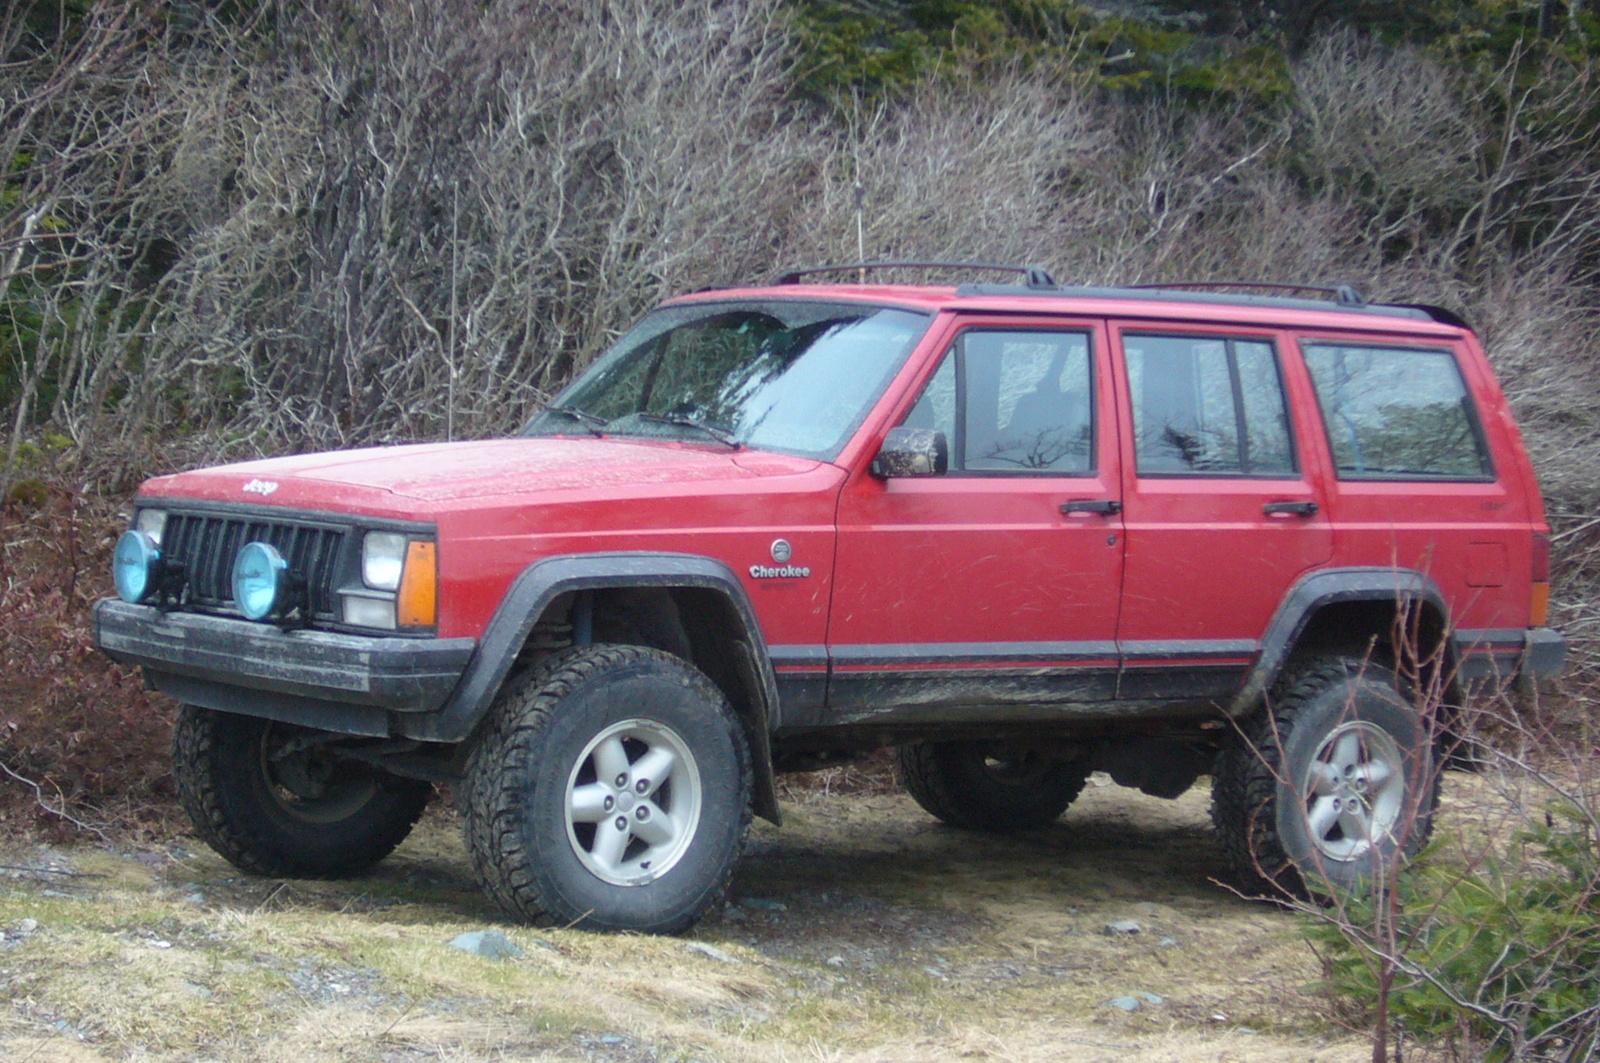 1981 jeep wagoneer pictures cargurus - 1988 Jeep Cherokee Overview Cargurus